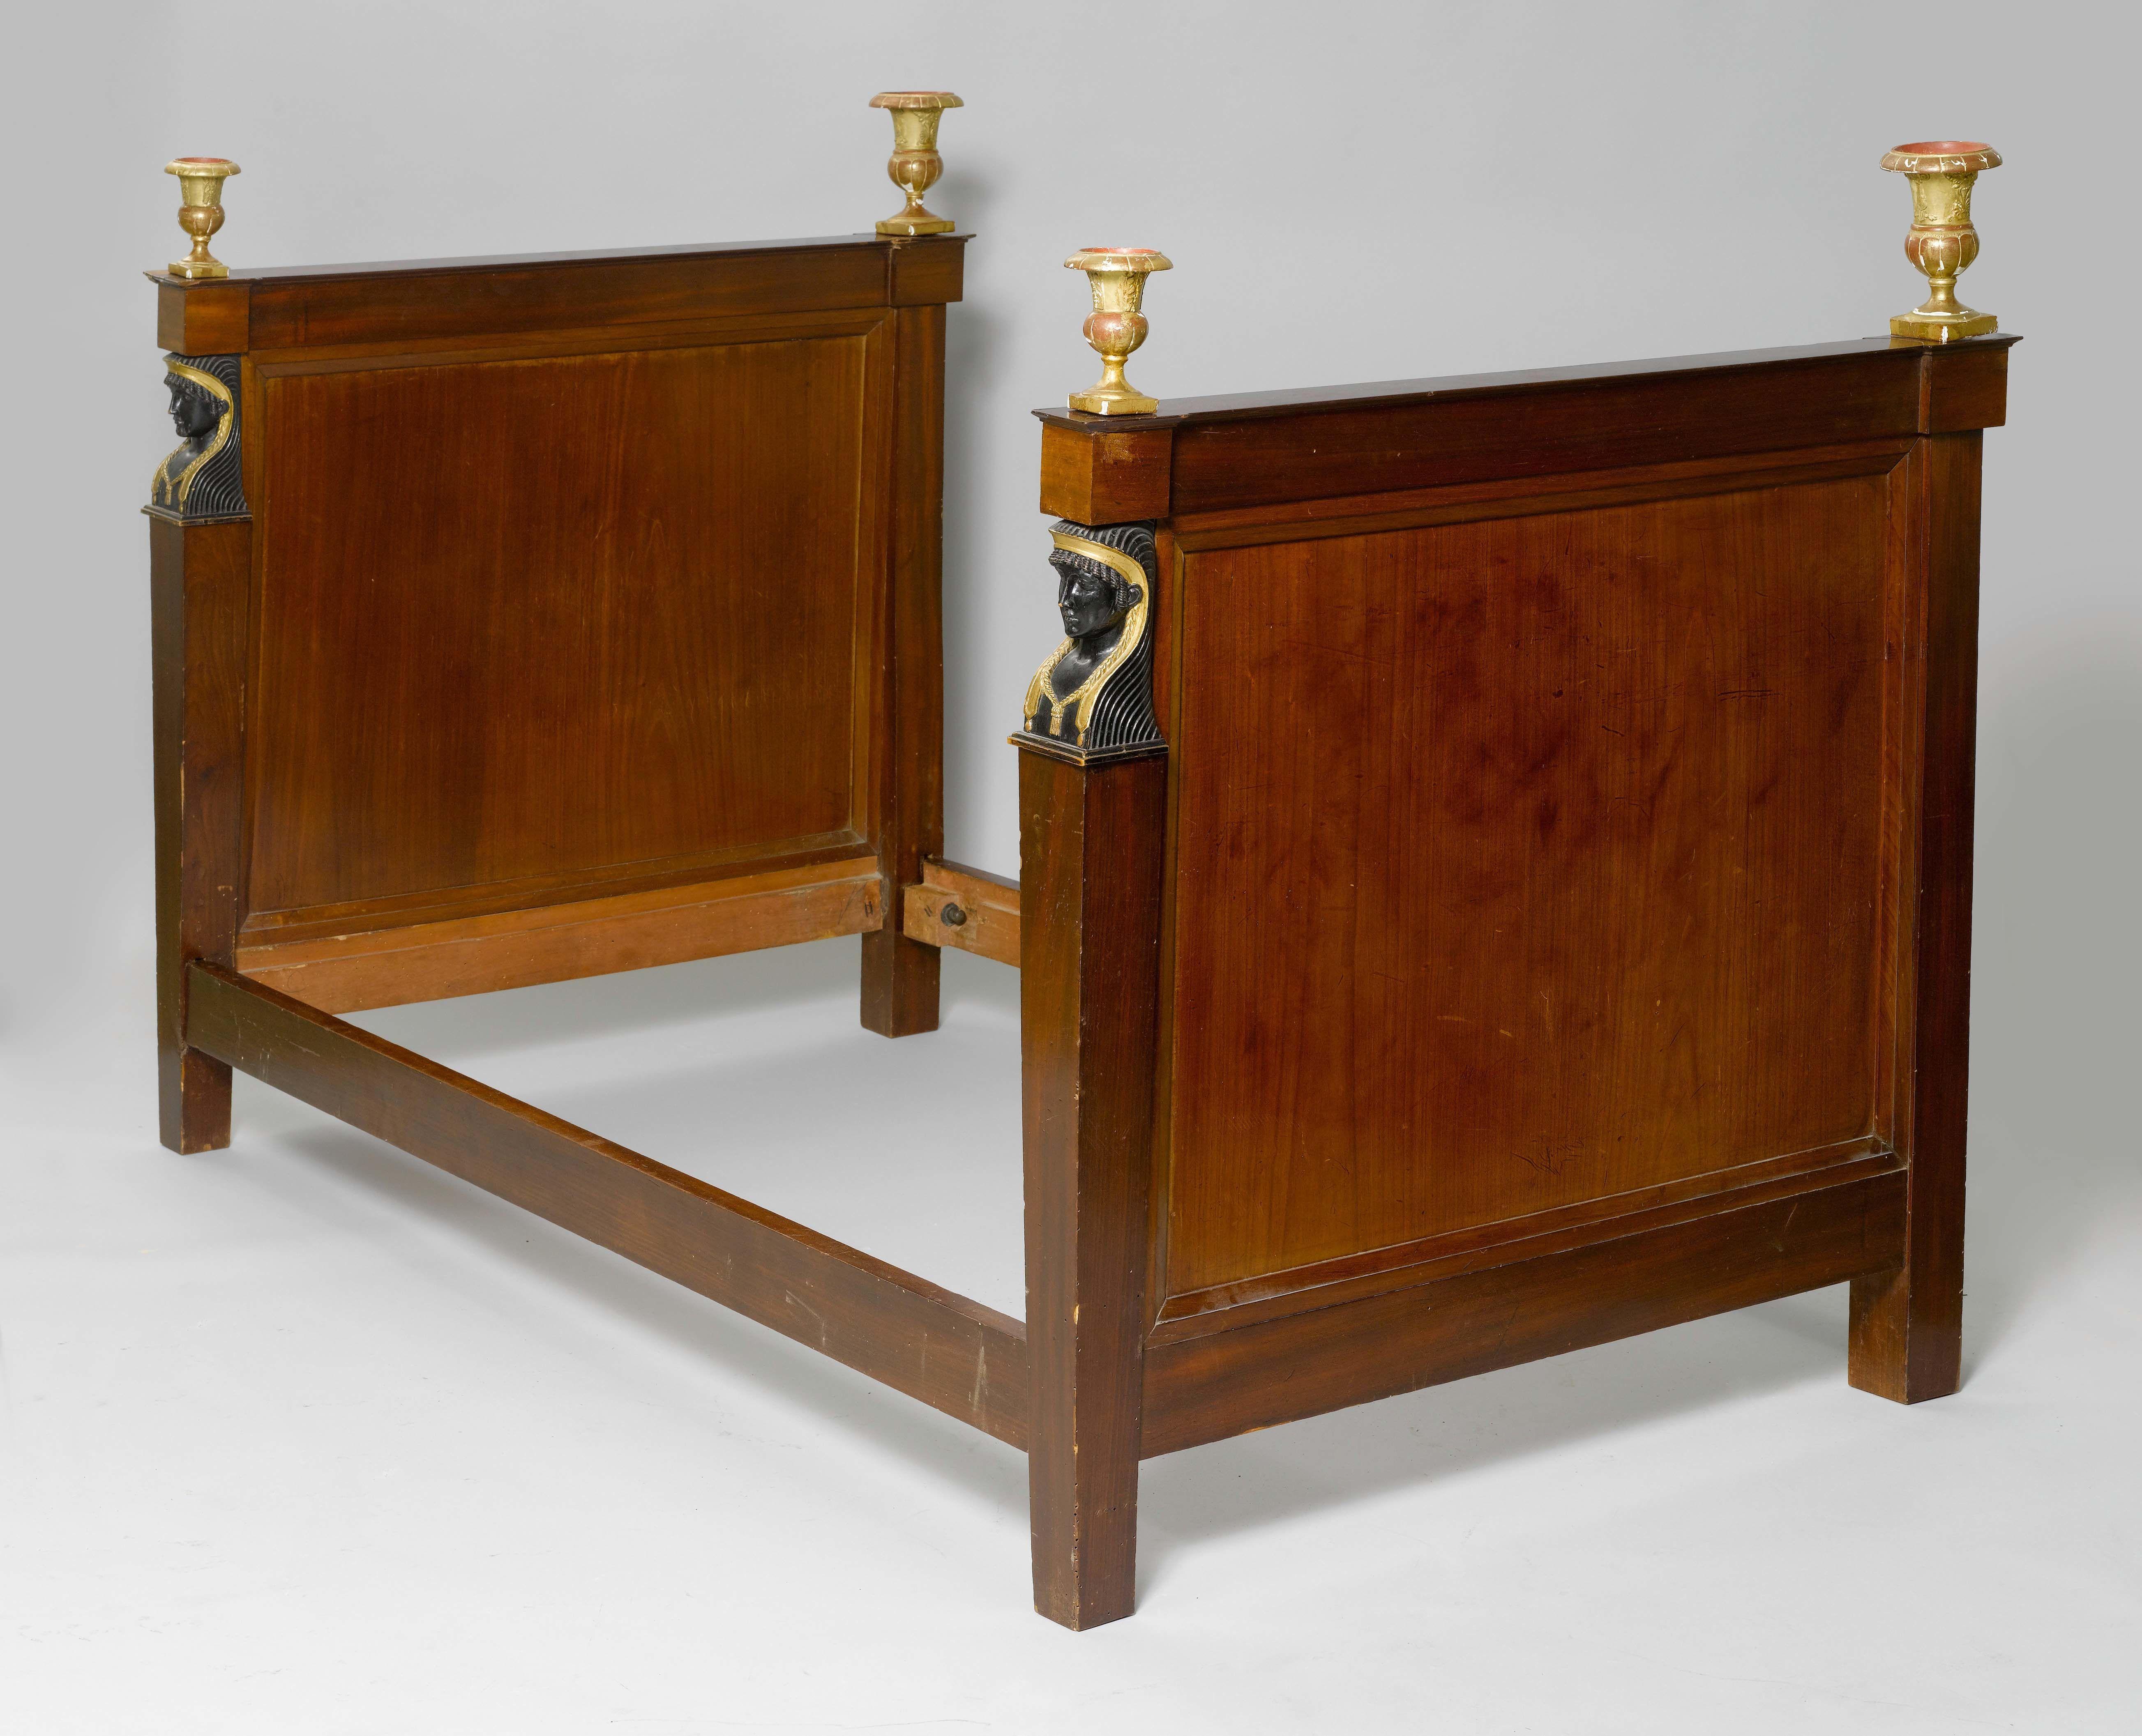 bett empire wohl italien lit empire pinterest. Black Bedroom Furniture Sets. Home Design Ideas